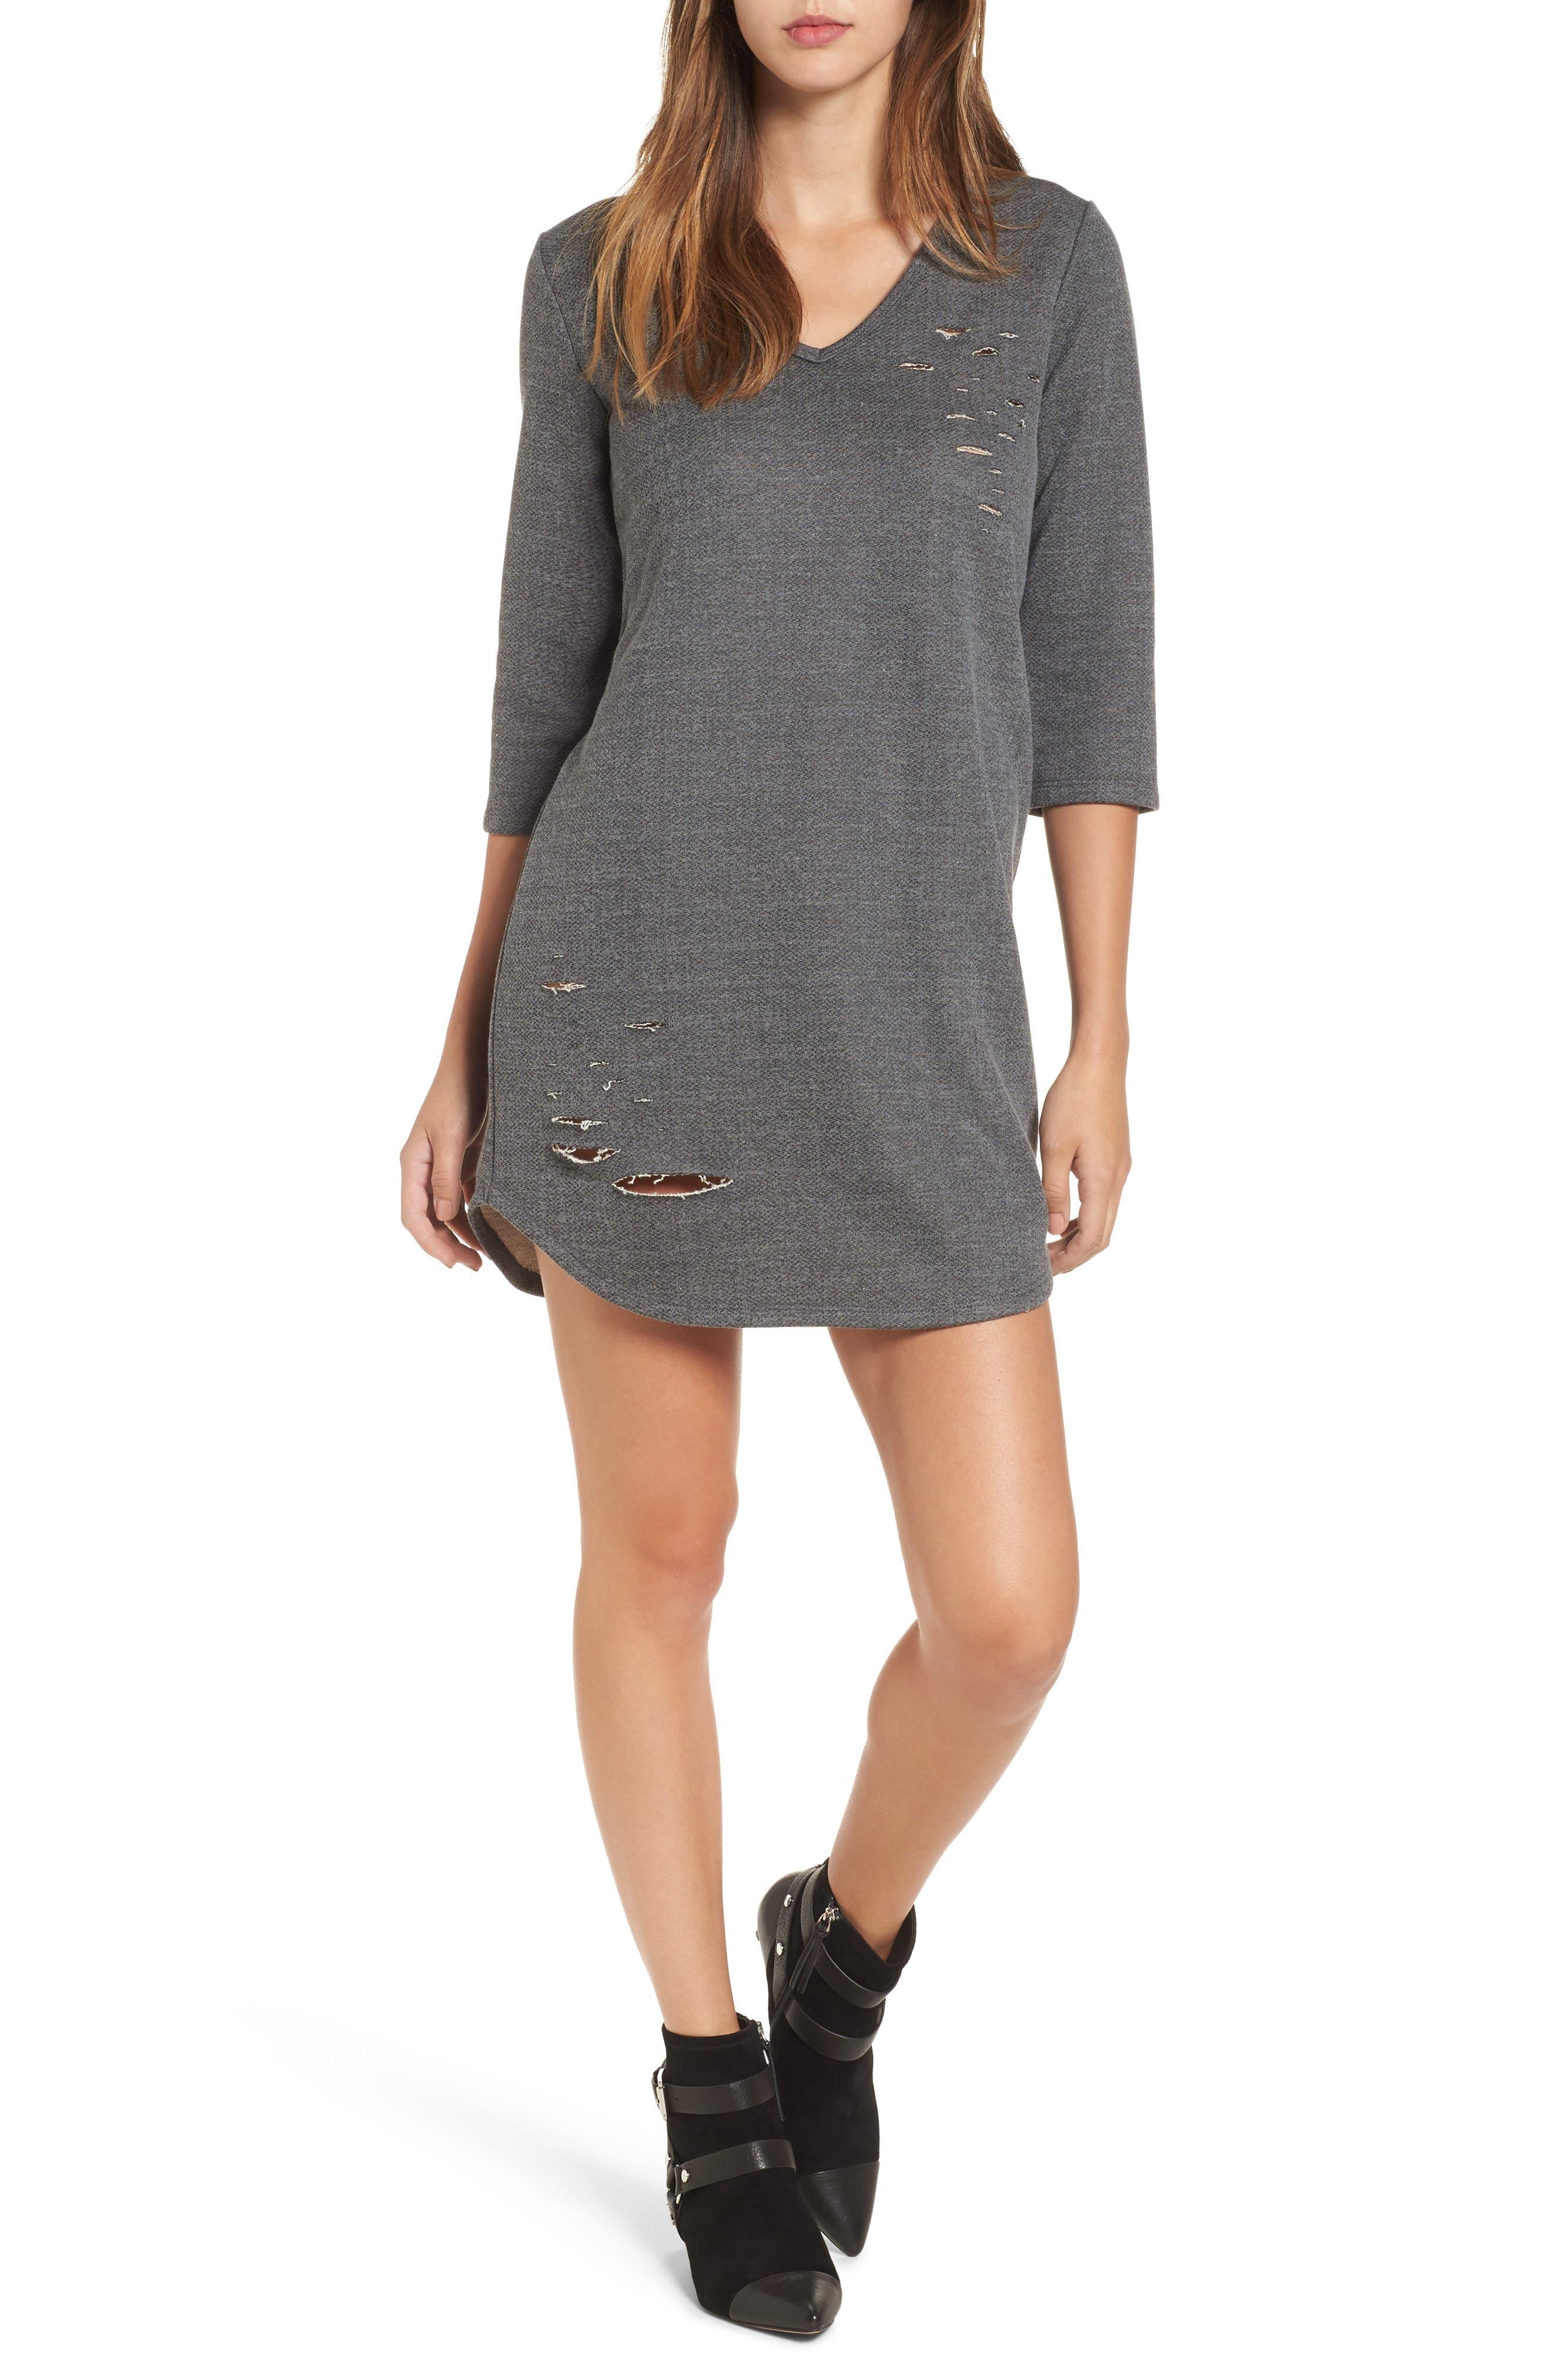 Main Image - Everly Distressed Sweatshirt Dress